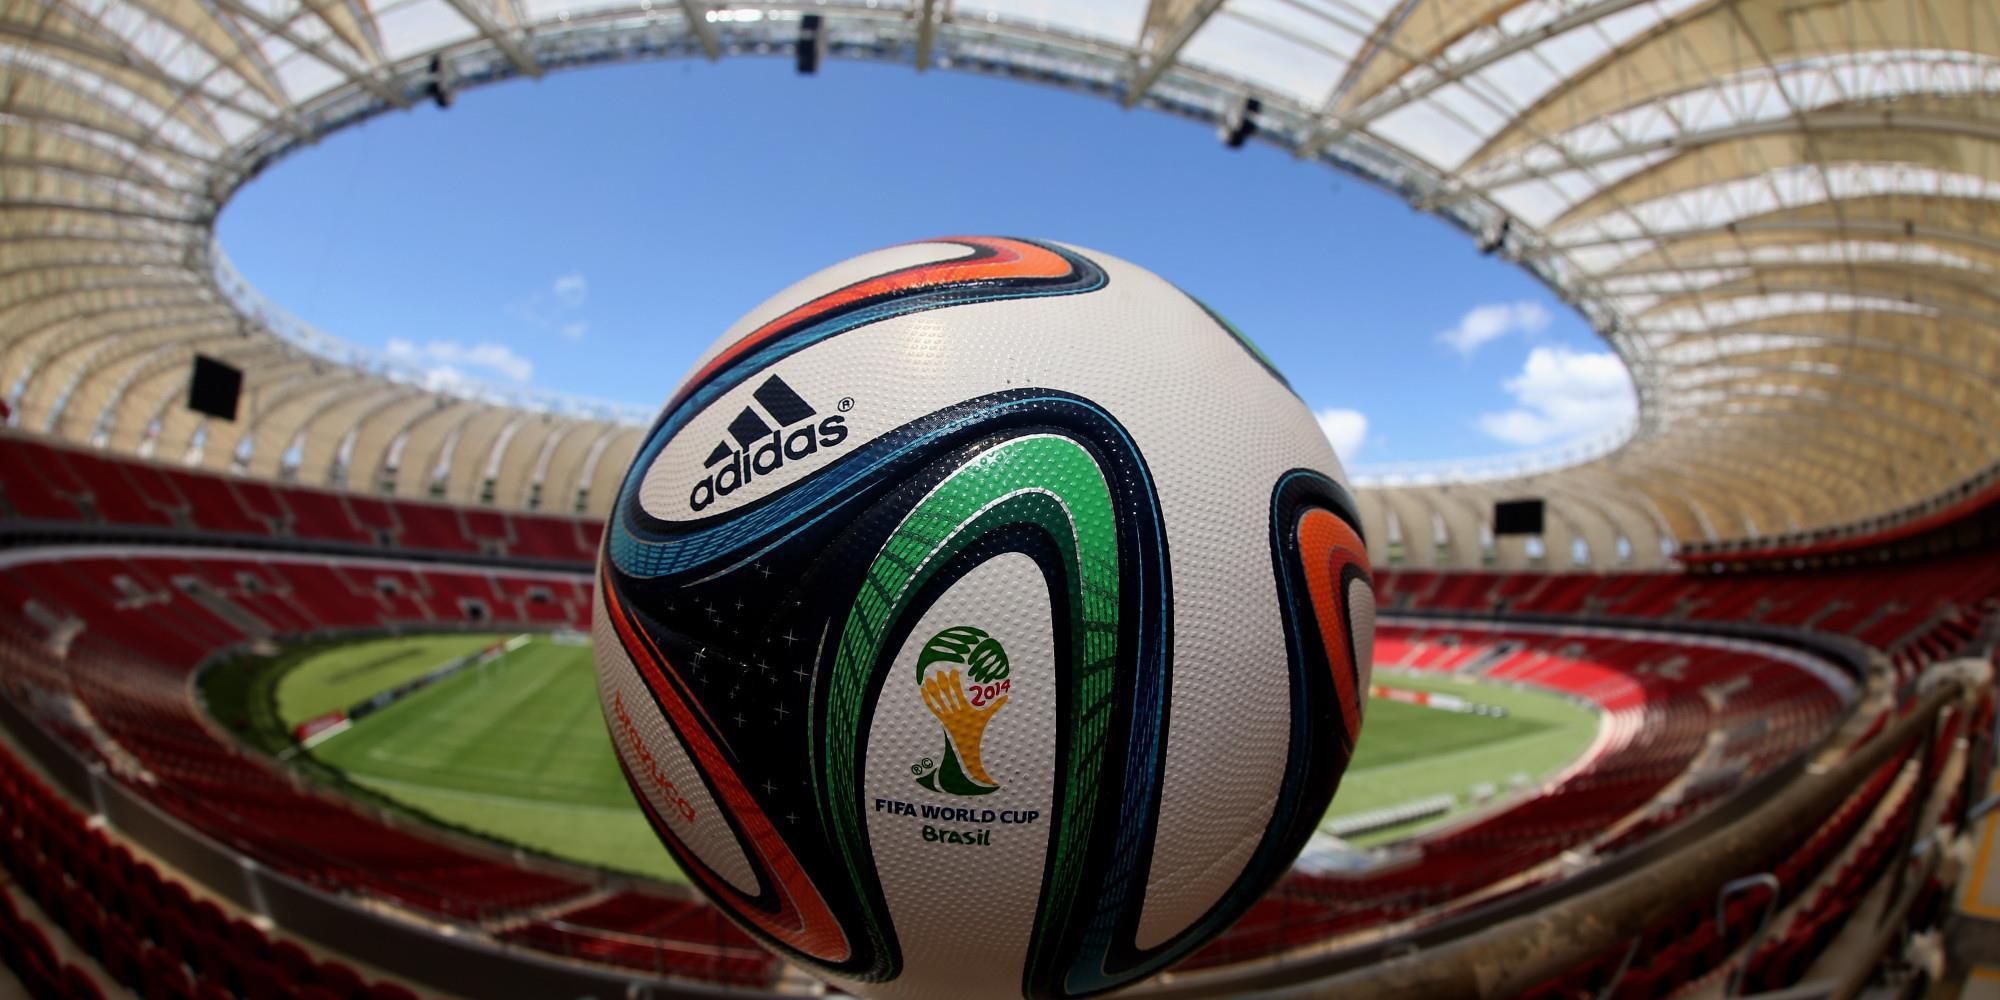 world-cup-brazil-2014-adidas